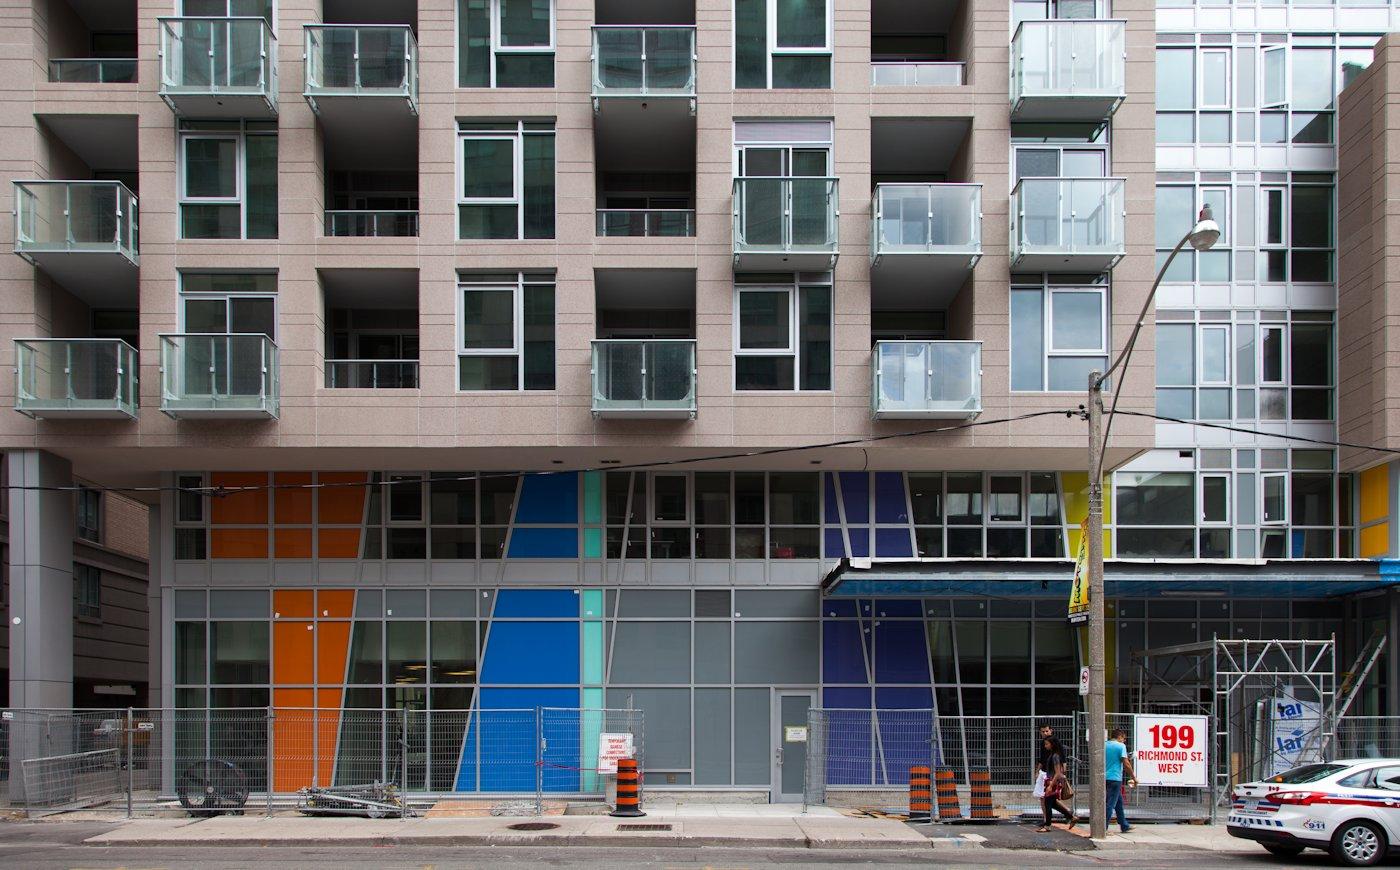 studio and studio2 on richmond 131m 41s aspen ridge quadrangle page 46 urbantoronto. Black Bedroom Furniture Sets. Home Design Ideas